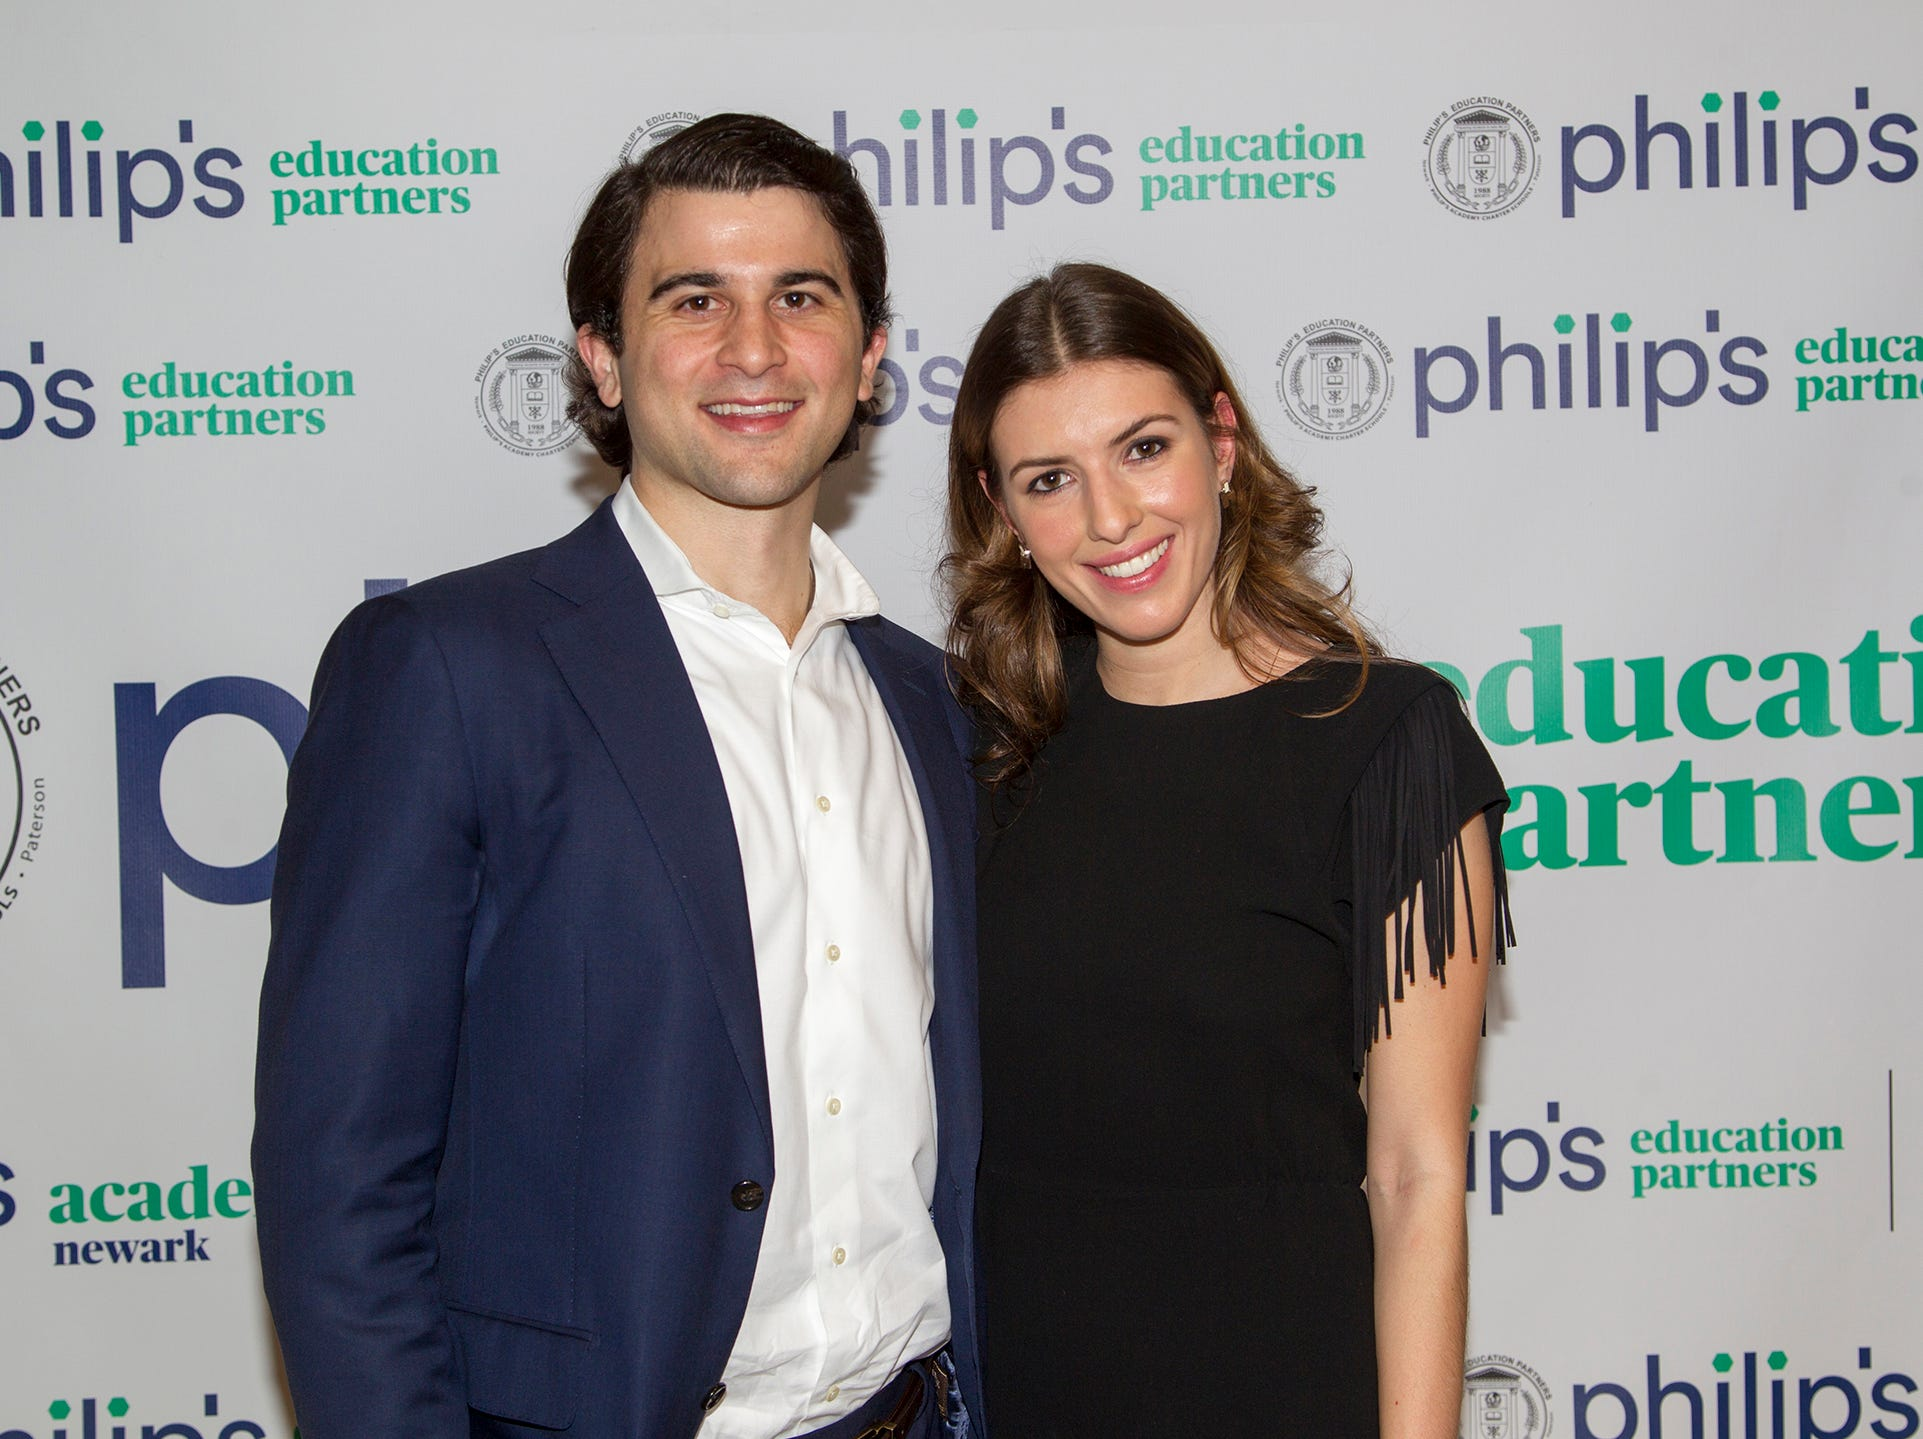 Alexander Masucci and Louisa Costa. Philip's Education Partners host The Dream Maker 30th anniversary gala at The Mezzanine in Newark 3/29/2019.